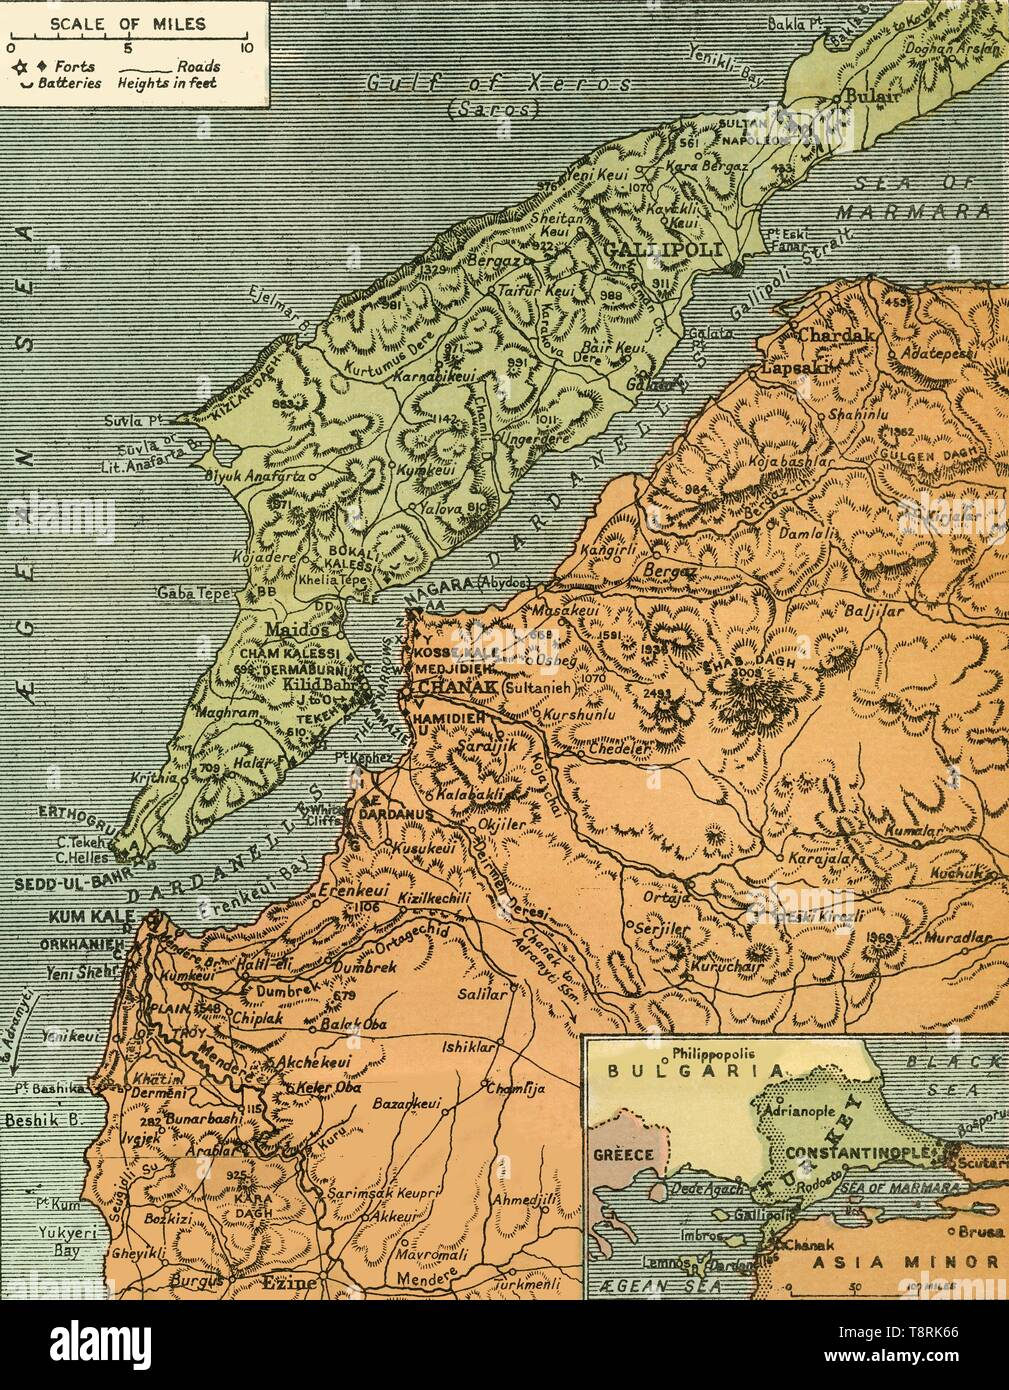 Dardanelles Map Stock Photos & Dardanelles Map Stock Images ... on aegean sea map, bosphorus map, strait of magellan map, asia minor, hellespont map, golden horn, sea of marmara, strait of gibraltar, bosporus map, gallipoli map, iberian peninsula map, gulf of aqaba map, ural mountains map, gibraltar map, black sea map, pyrenees map, aegean sea, mediterranean sea map, english channel map, sea of marmara map, strait of hormuz map, adriatic sea map, strait of hormuz, ionian sea, black sea, constantinople map, dead sea map, battle of gallipoli, adriatic sea, sarajevo map, strait of malacca, suez canal, hero and leander,